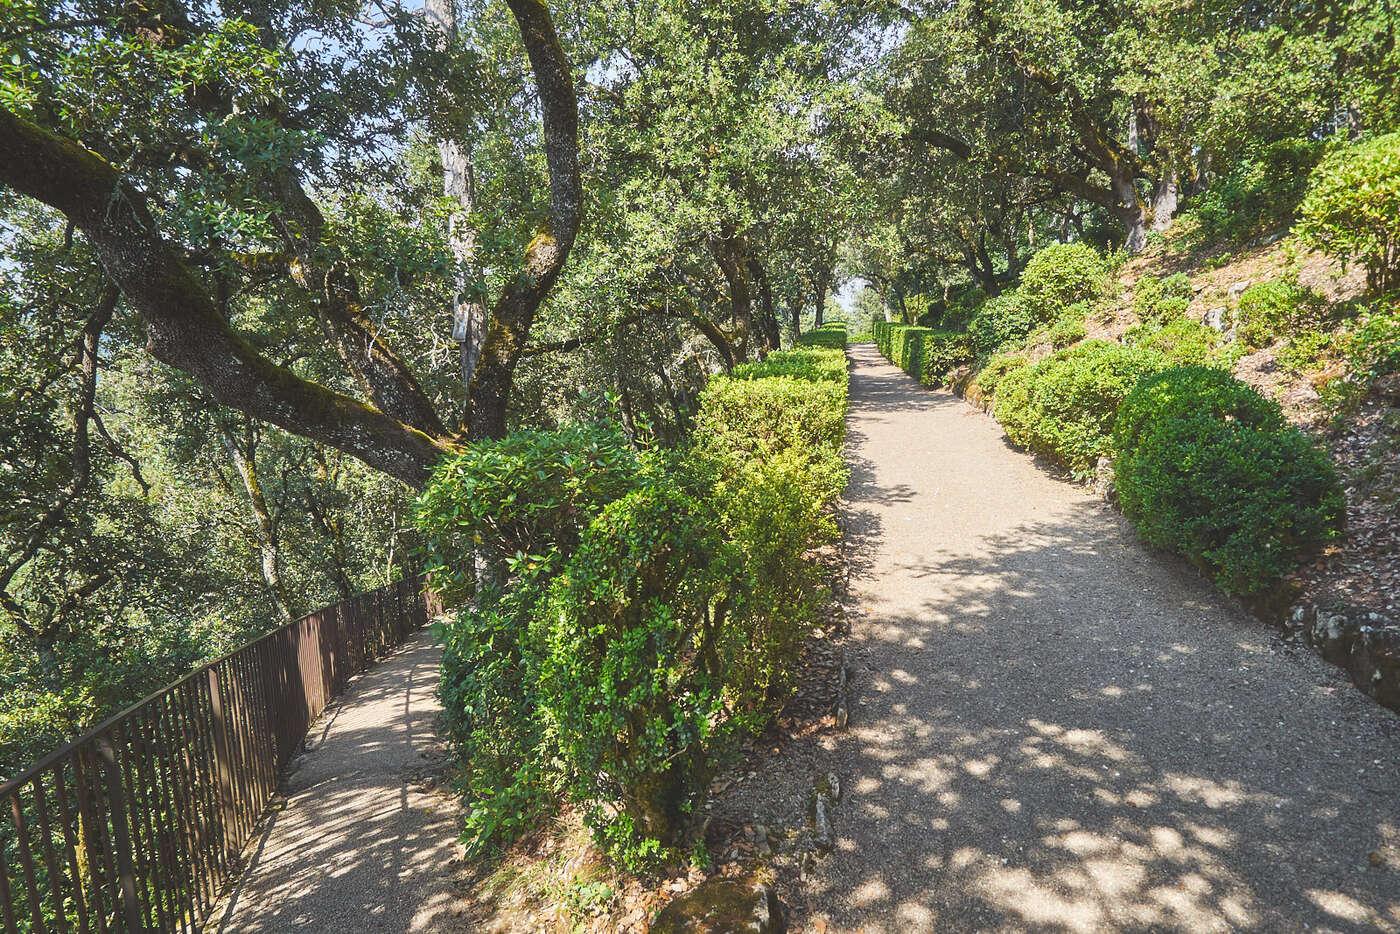 Chemins des jardins de Marqueyssac